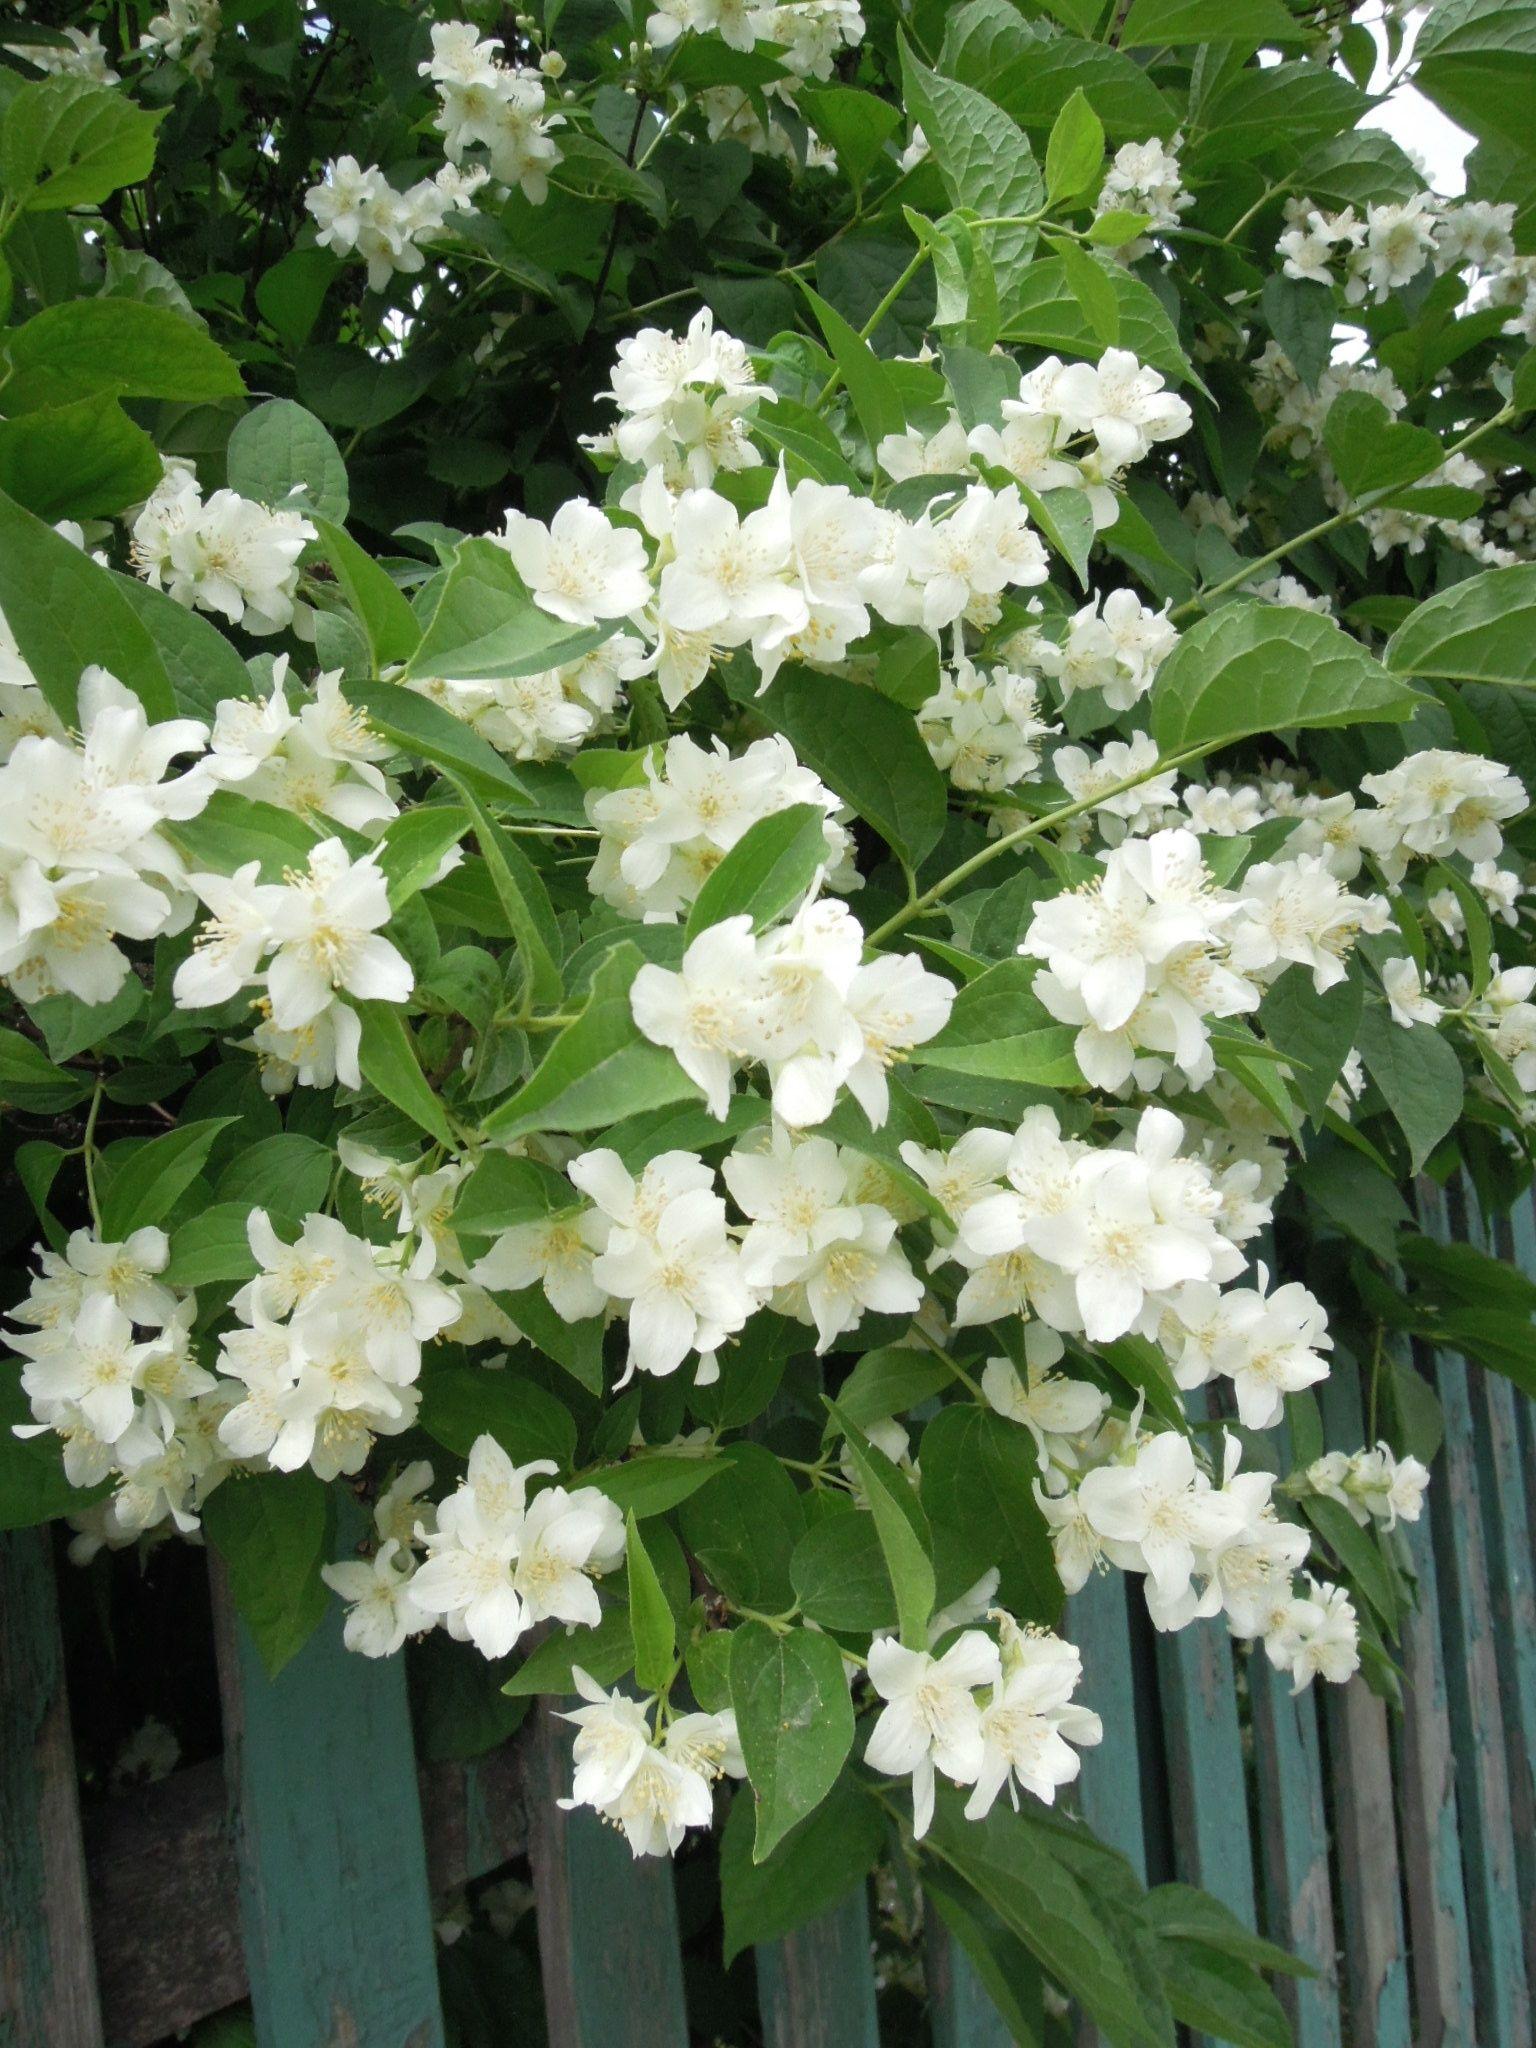 Weninspiration jasmine is relaxing and has soothing botanical weninspiration jasmine is relaxing and has soothing properties sometimes its used as an aphrodisiac izmirmasajfo